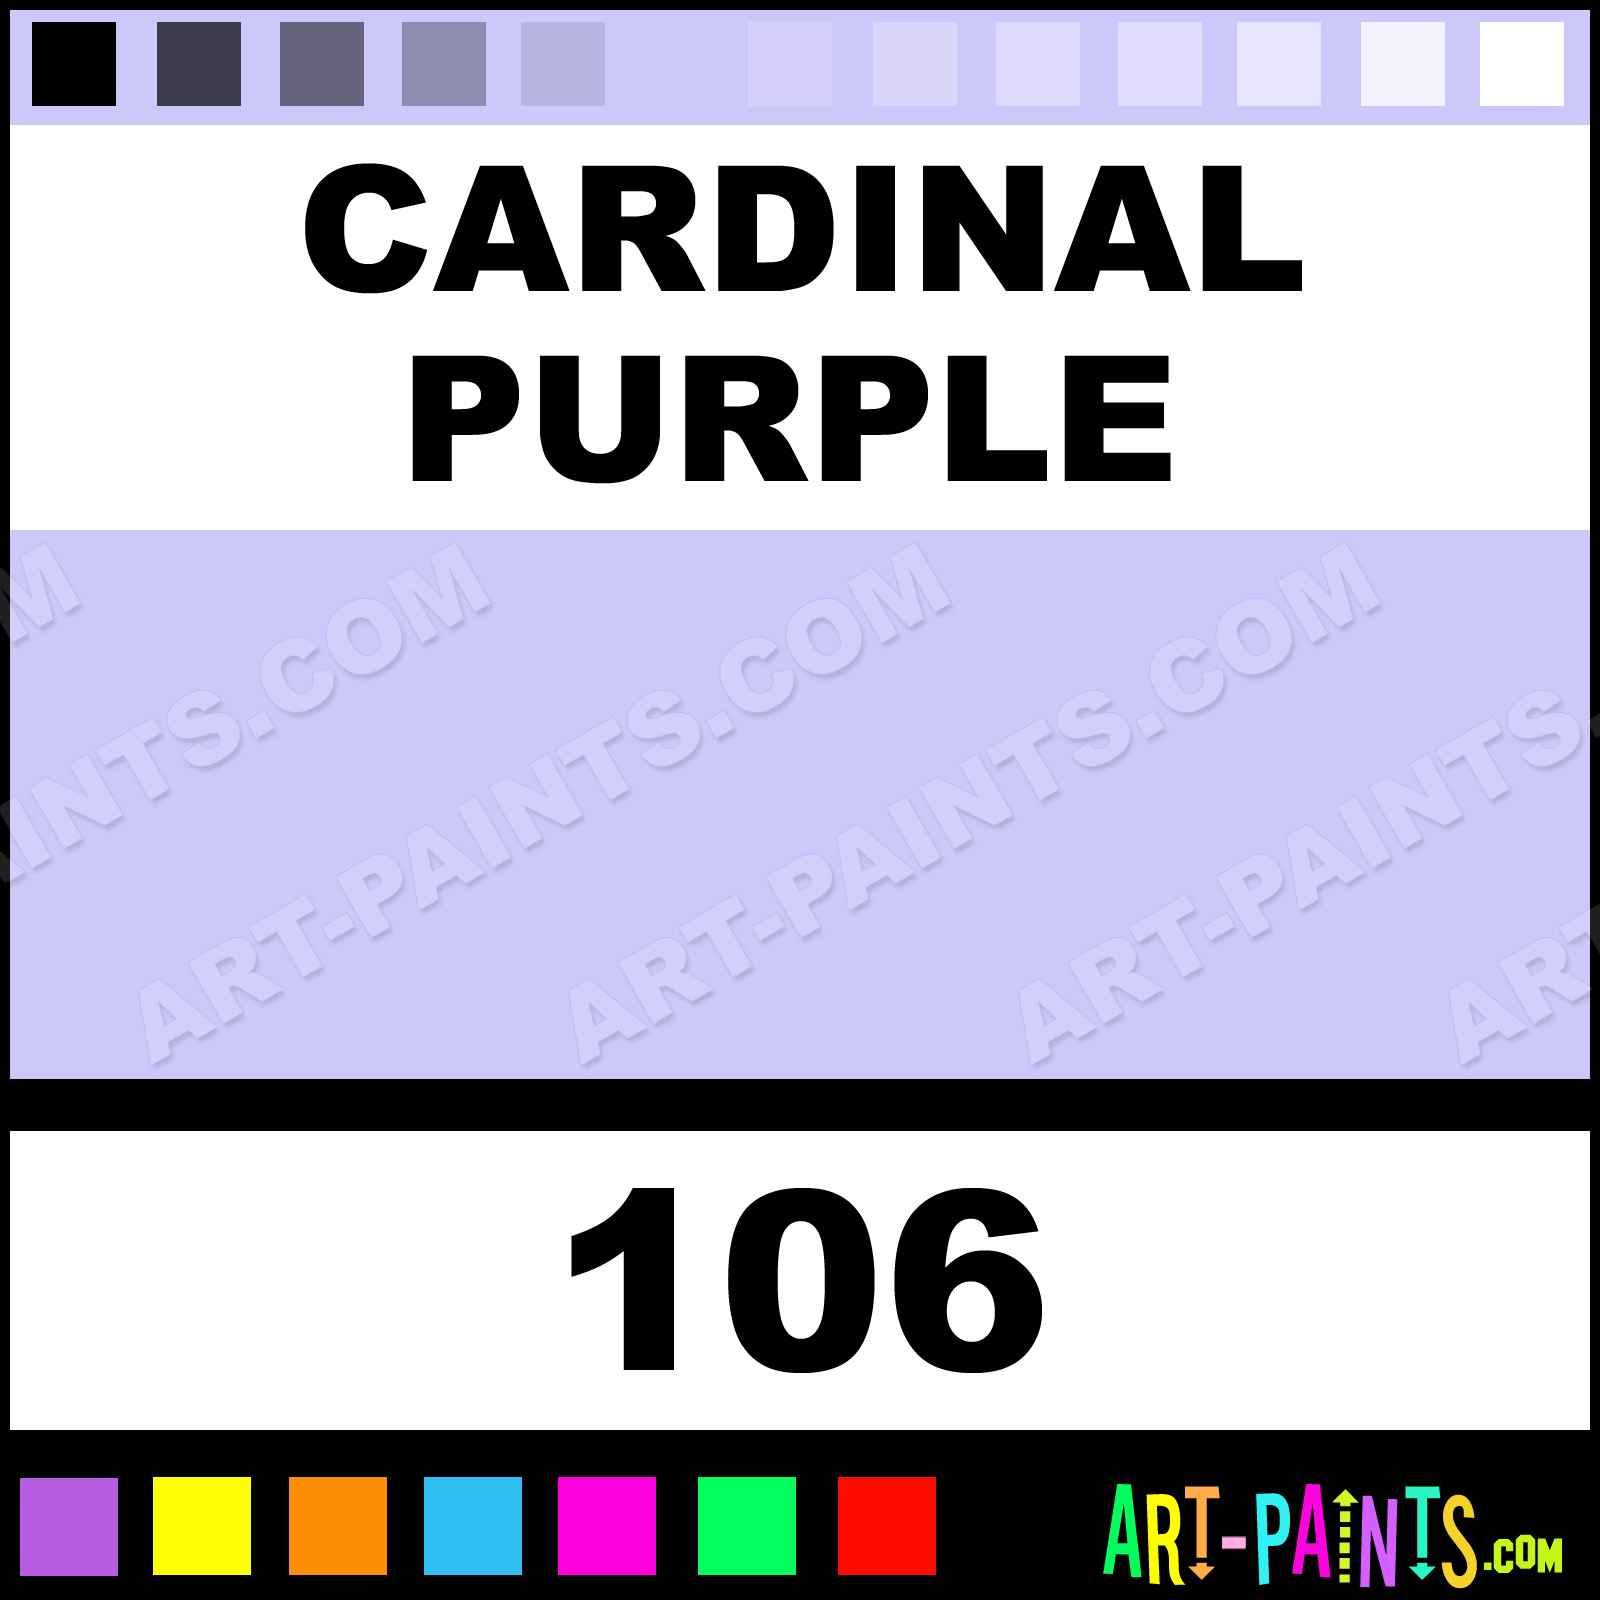 Cardinal Purple Pastel Casein Milk Paints - 106 - Cardinal Purple